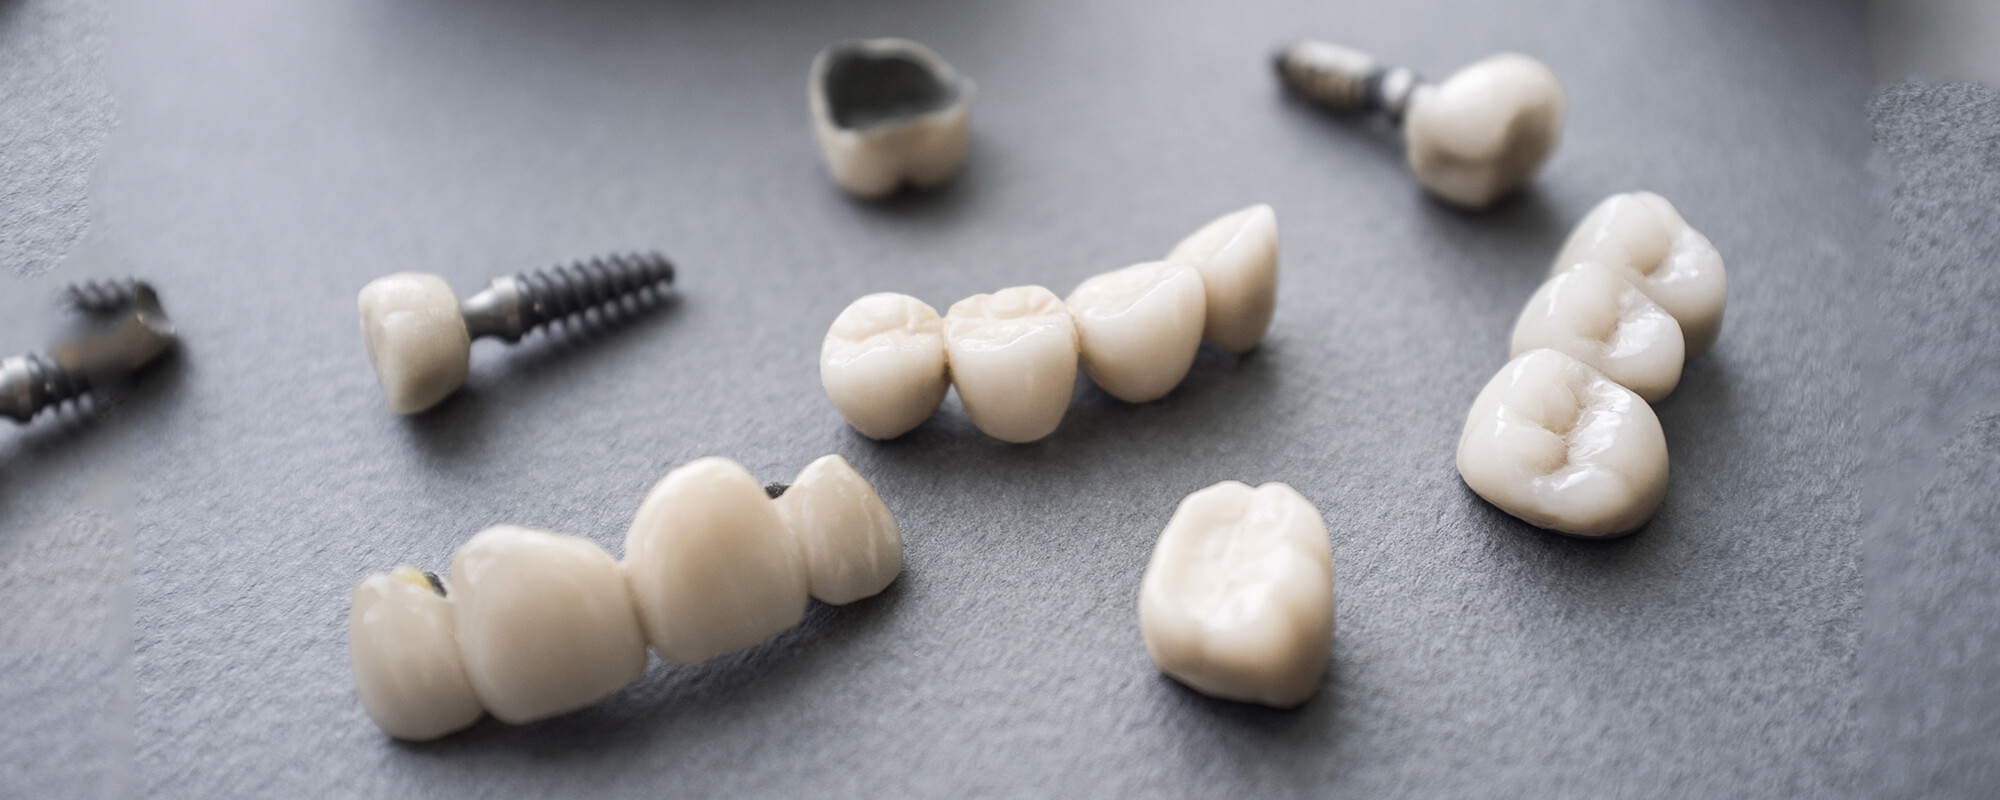 Dental implants on a dark gray table